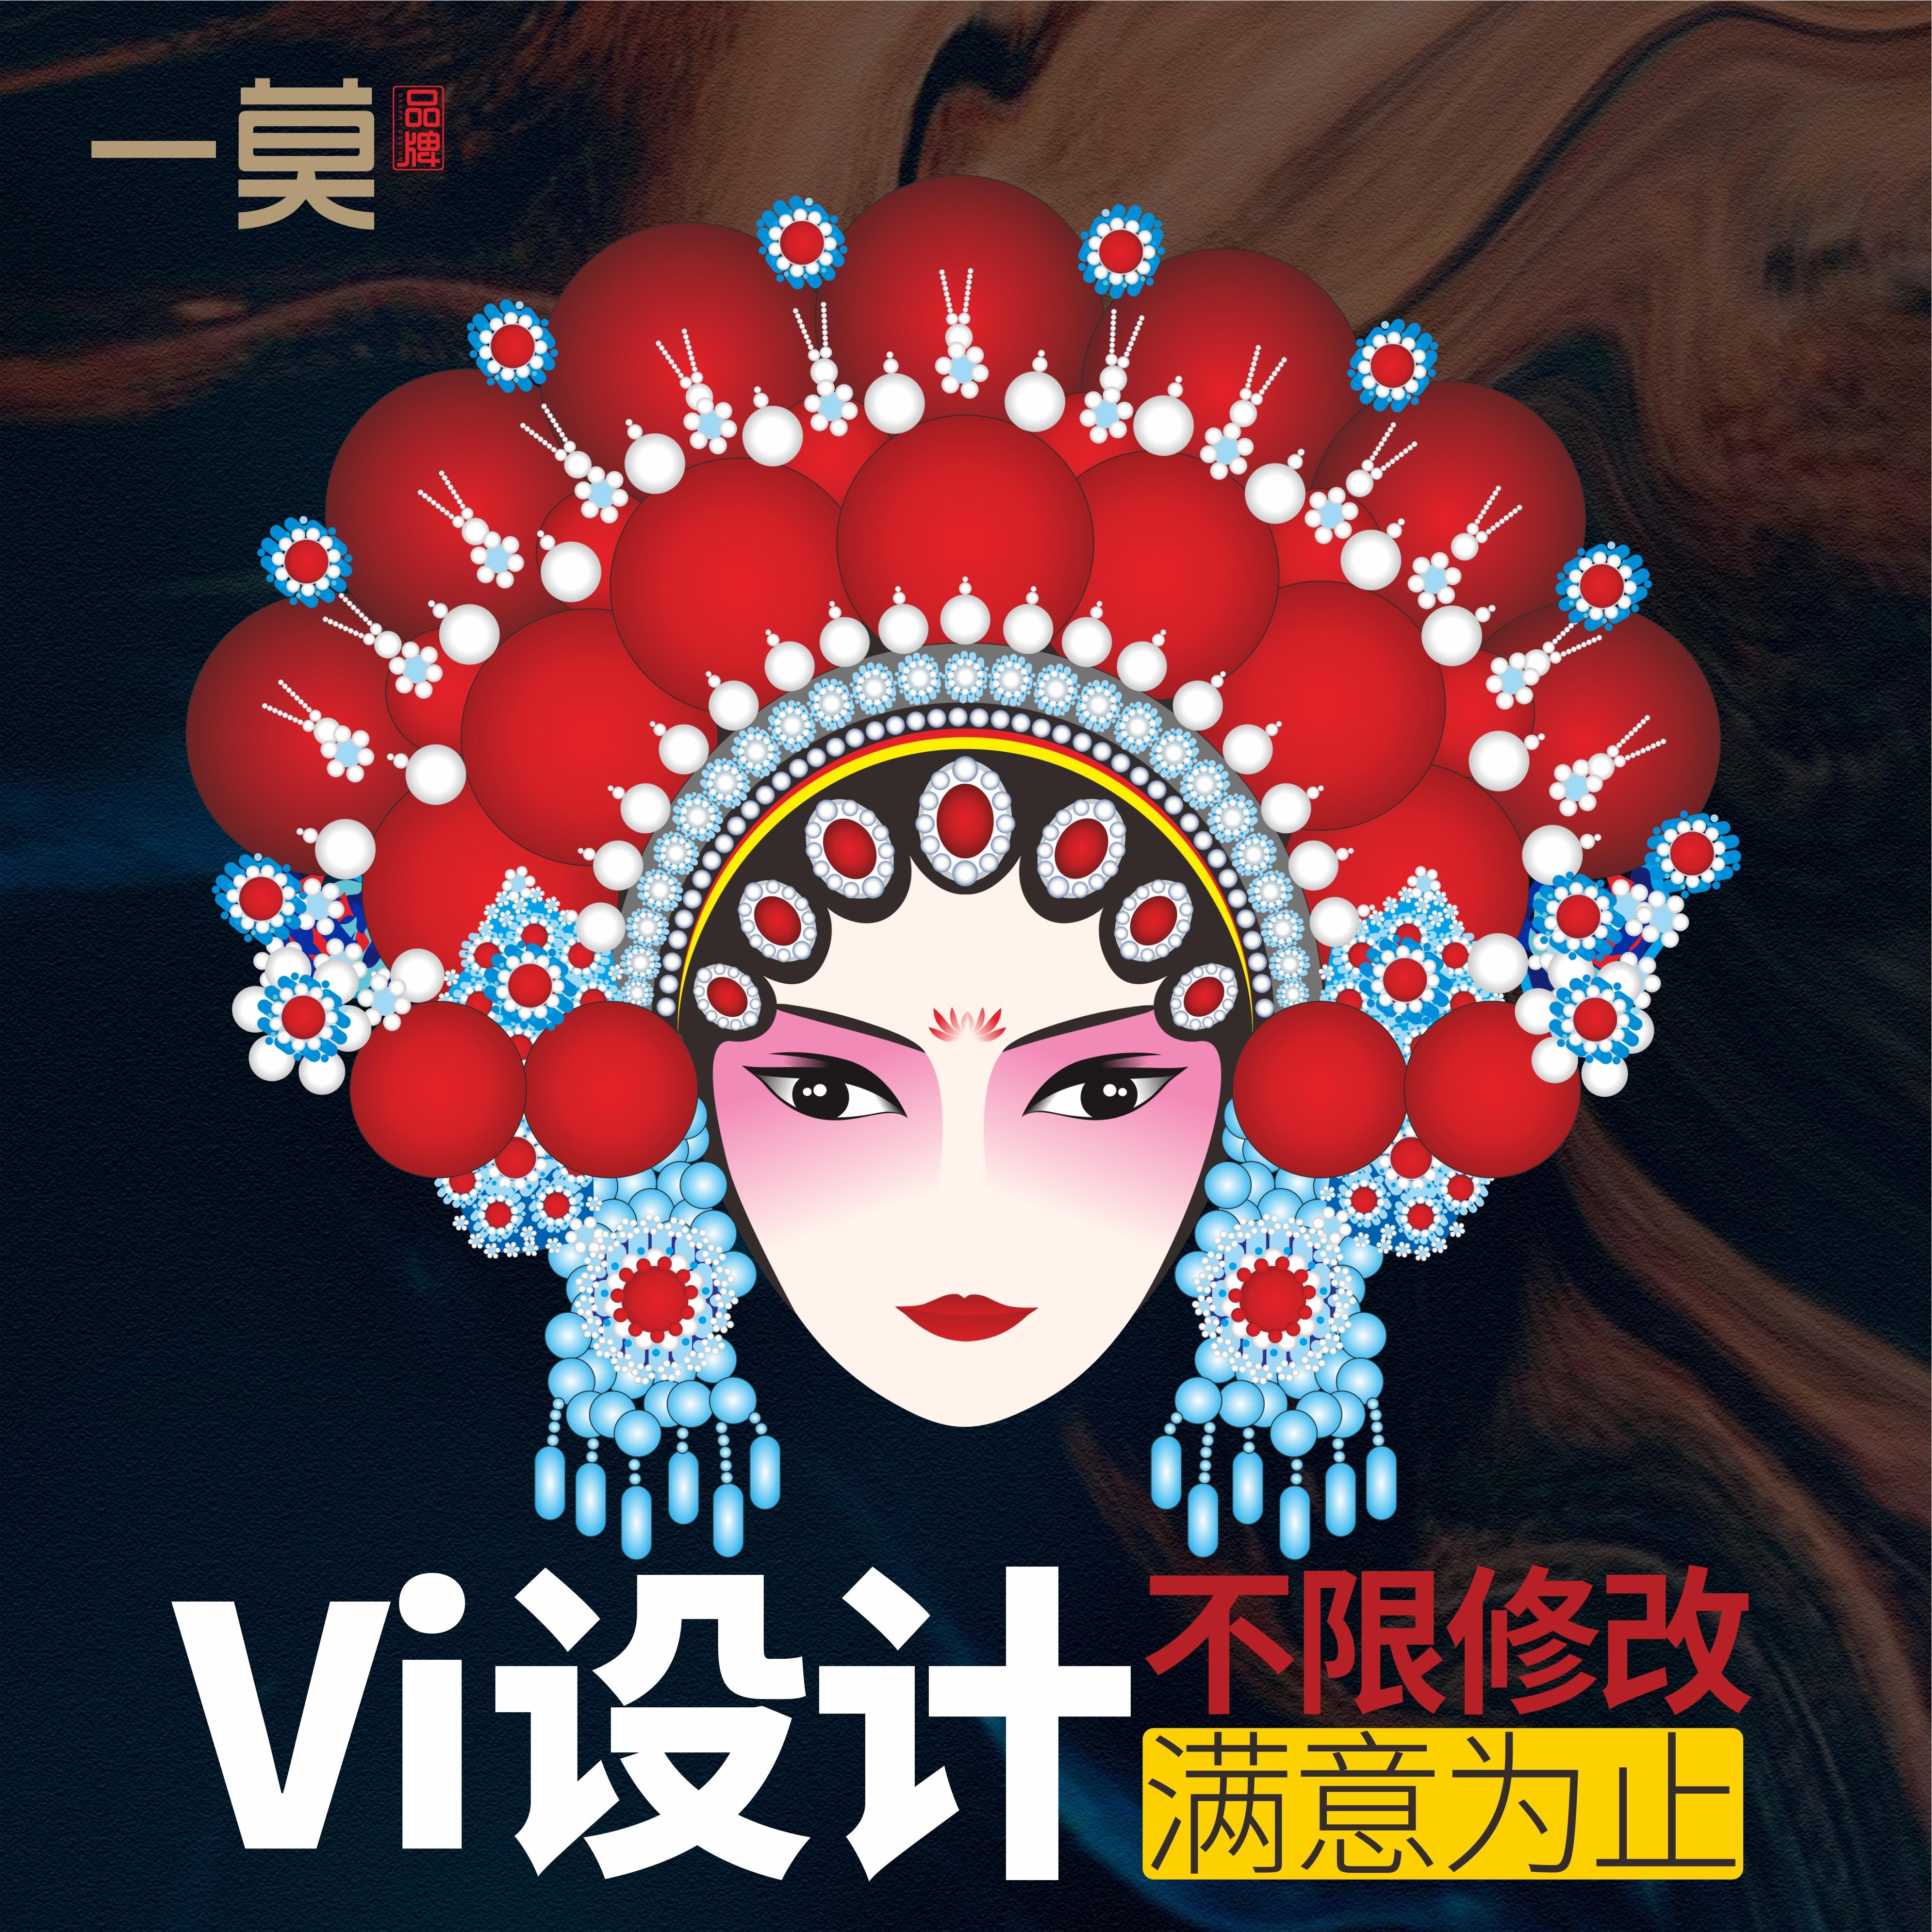 vi设计vis设计VI系统企业视觉识别系统导视烟酒科研酒店